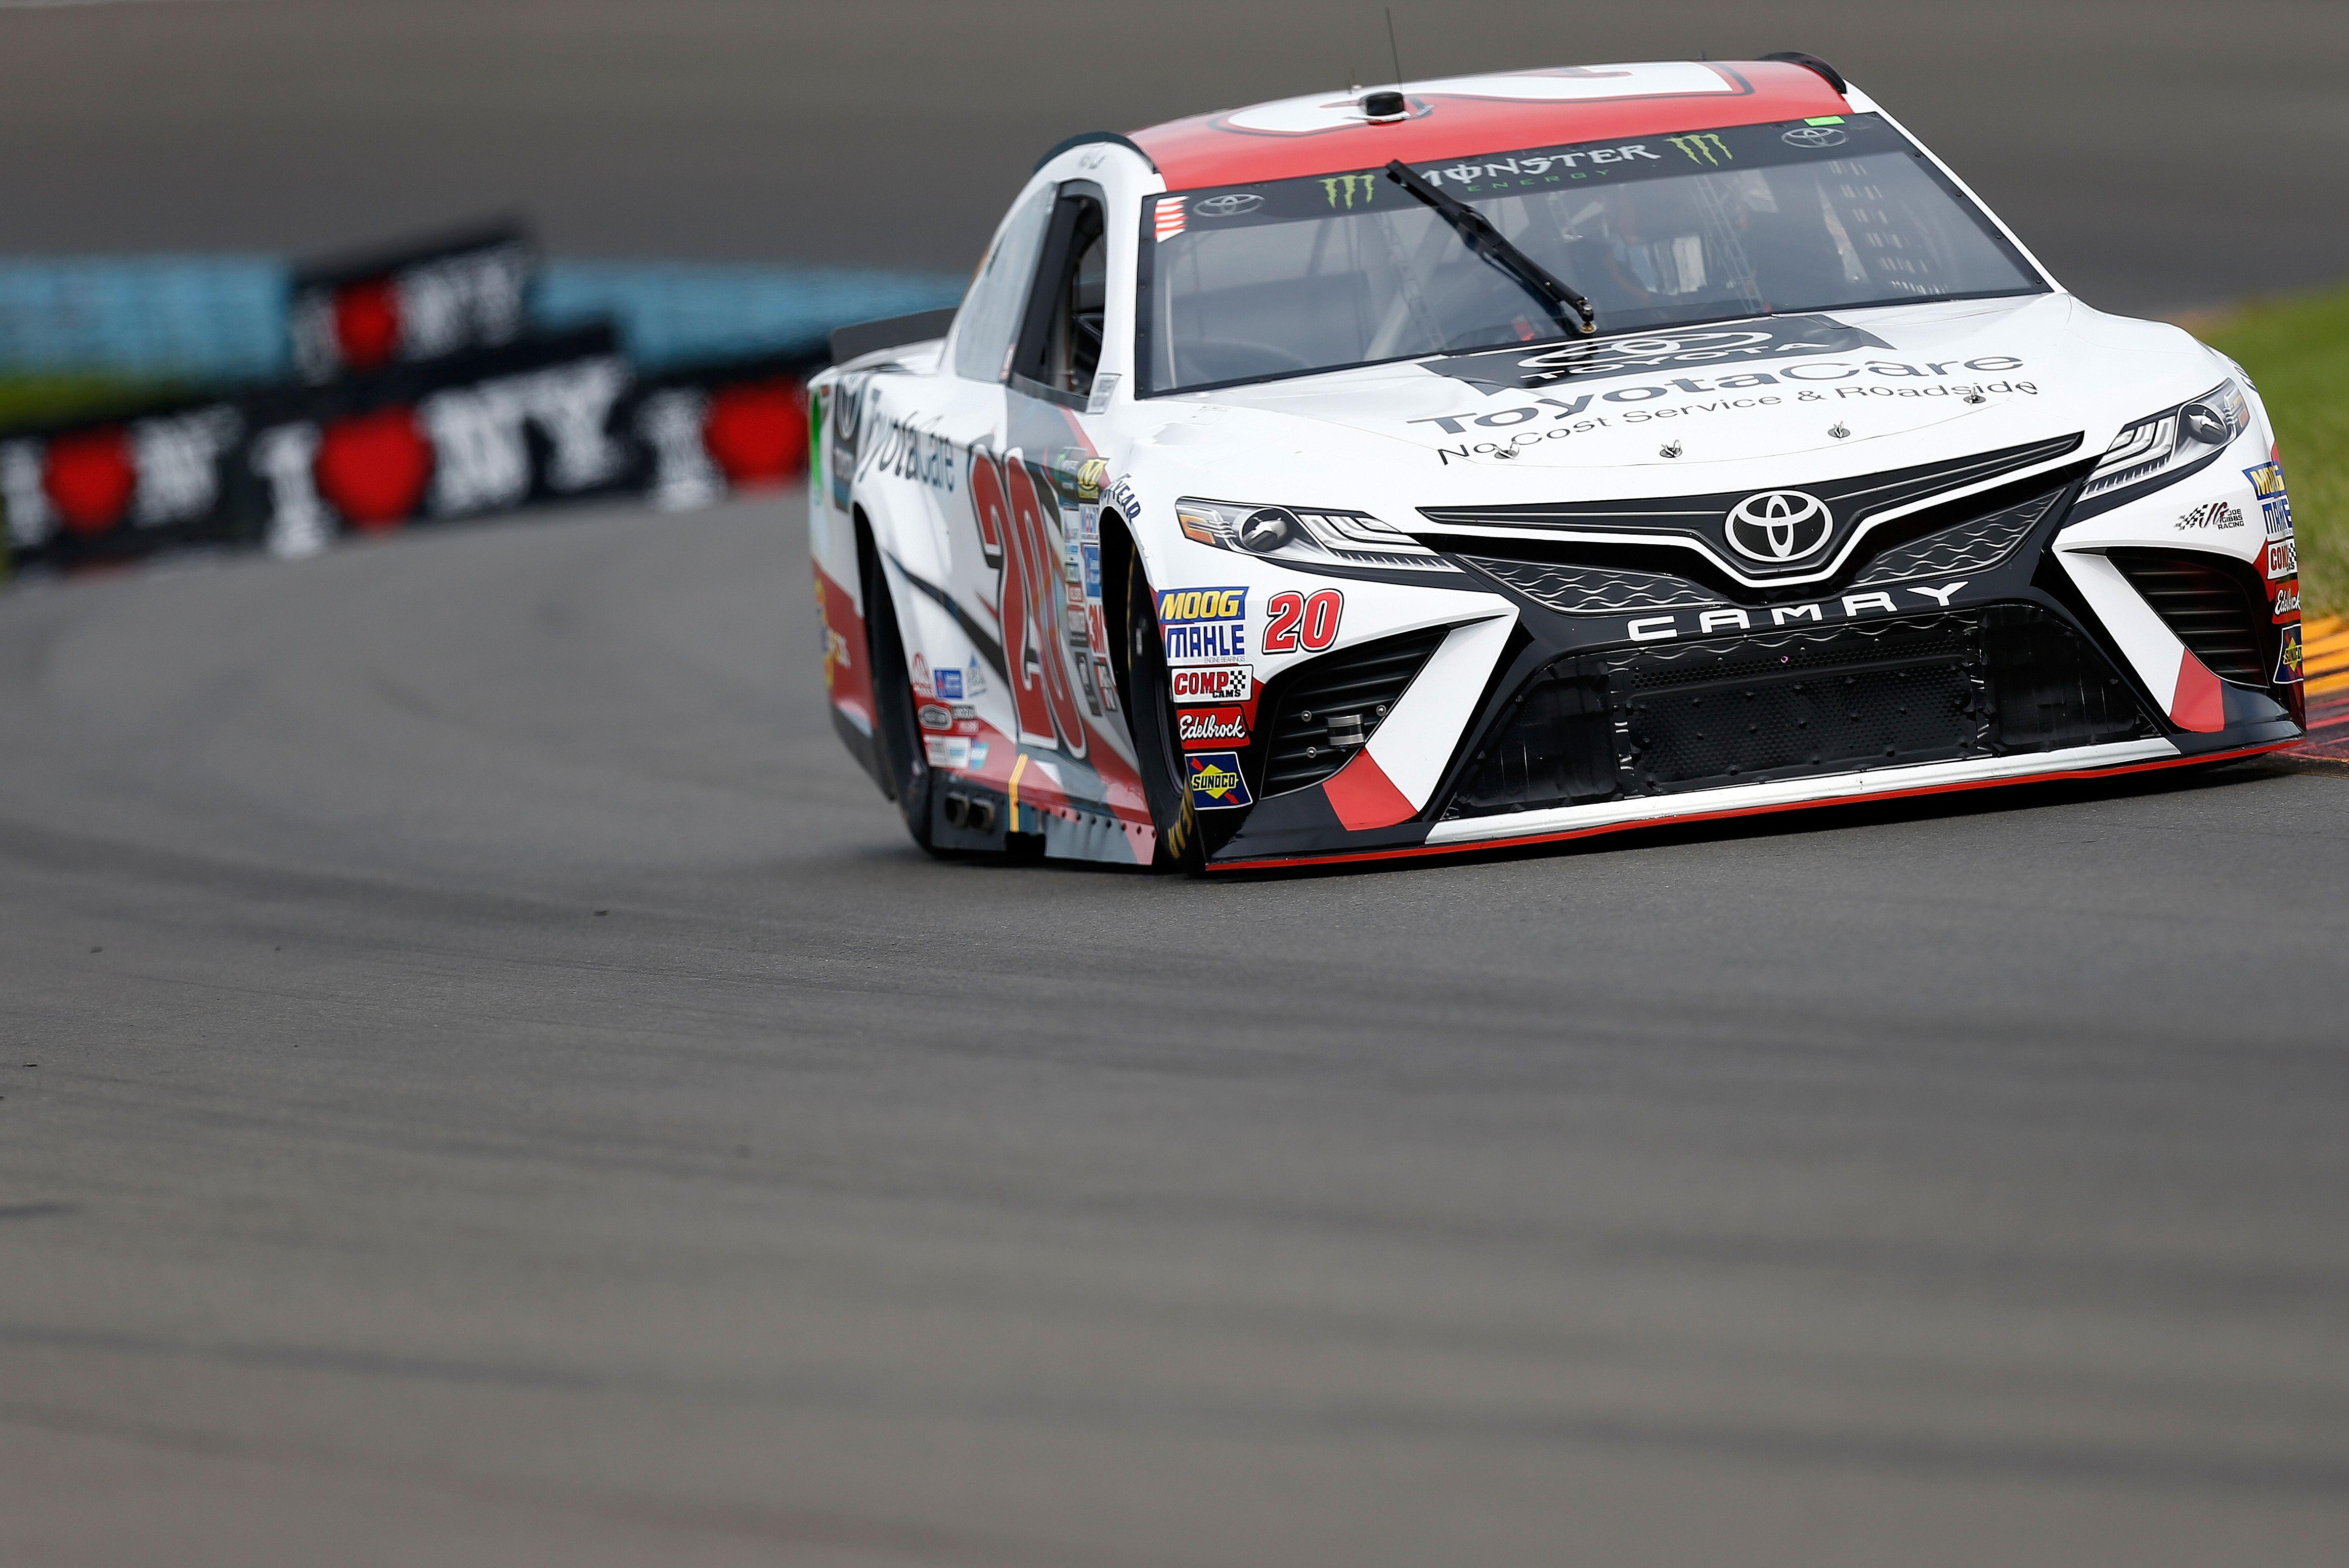 NASCAR: Five Possible Landing Spots for Matt Kenseth in 2018